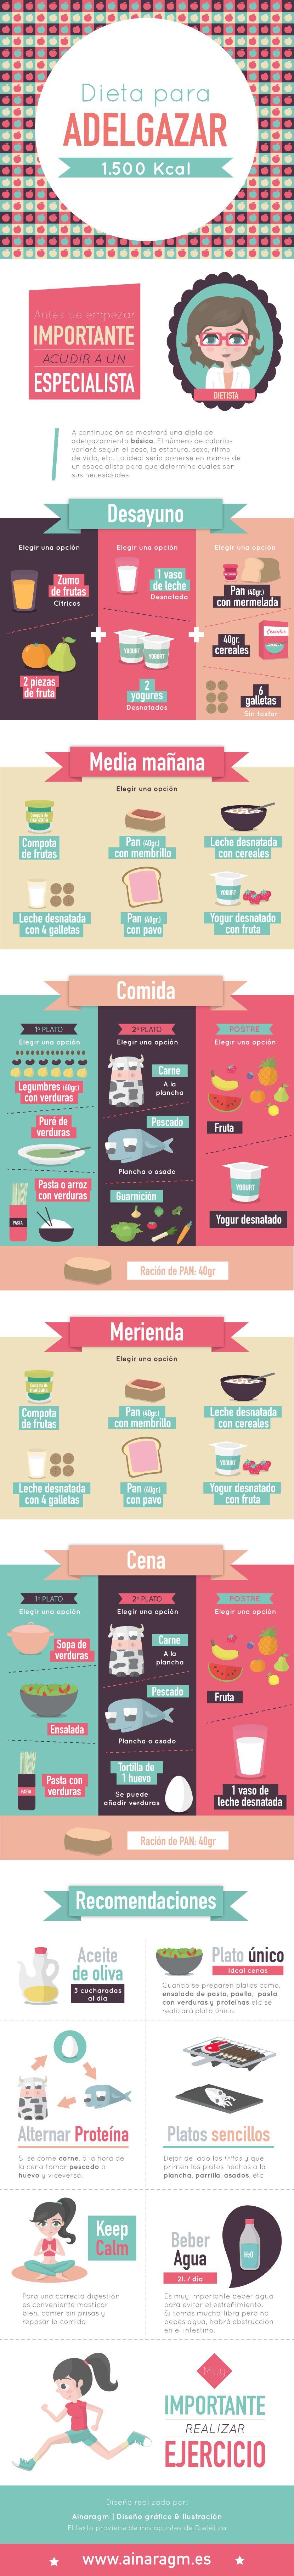 Infografia Sobre Una Dieta De Adelgazamiento Adelgazar  ~ Adelgazar Comiendo De Todo Pero Poco